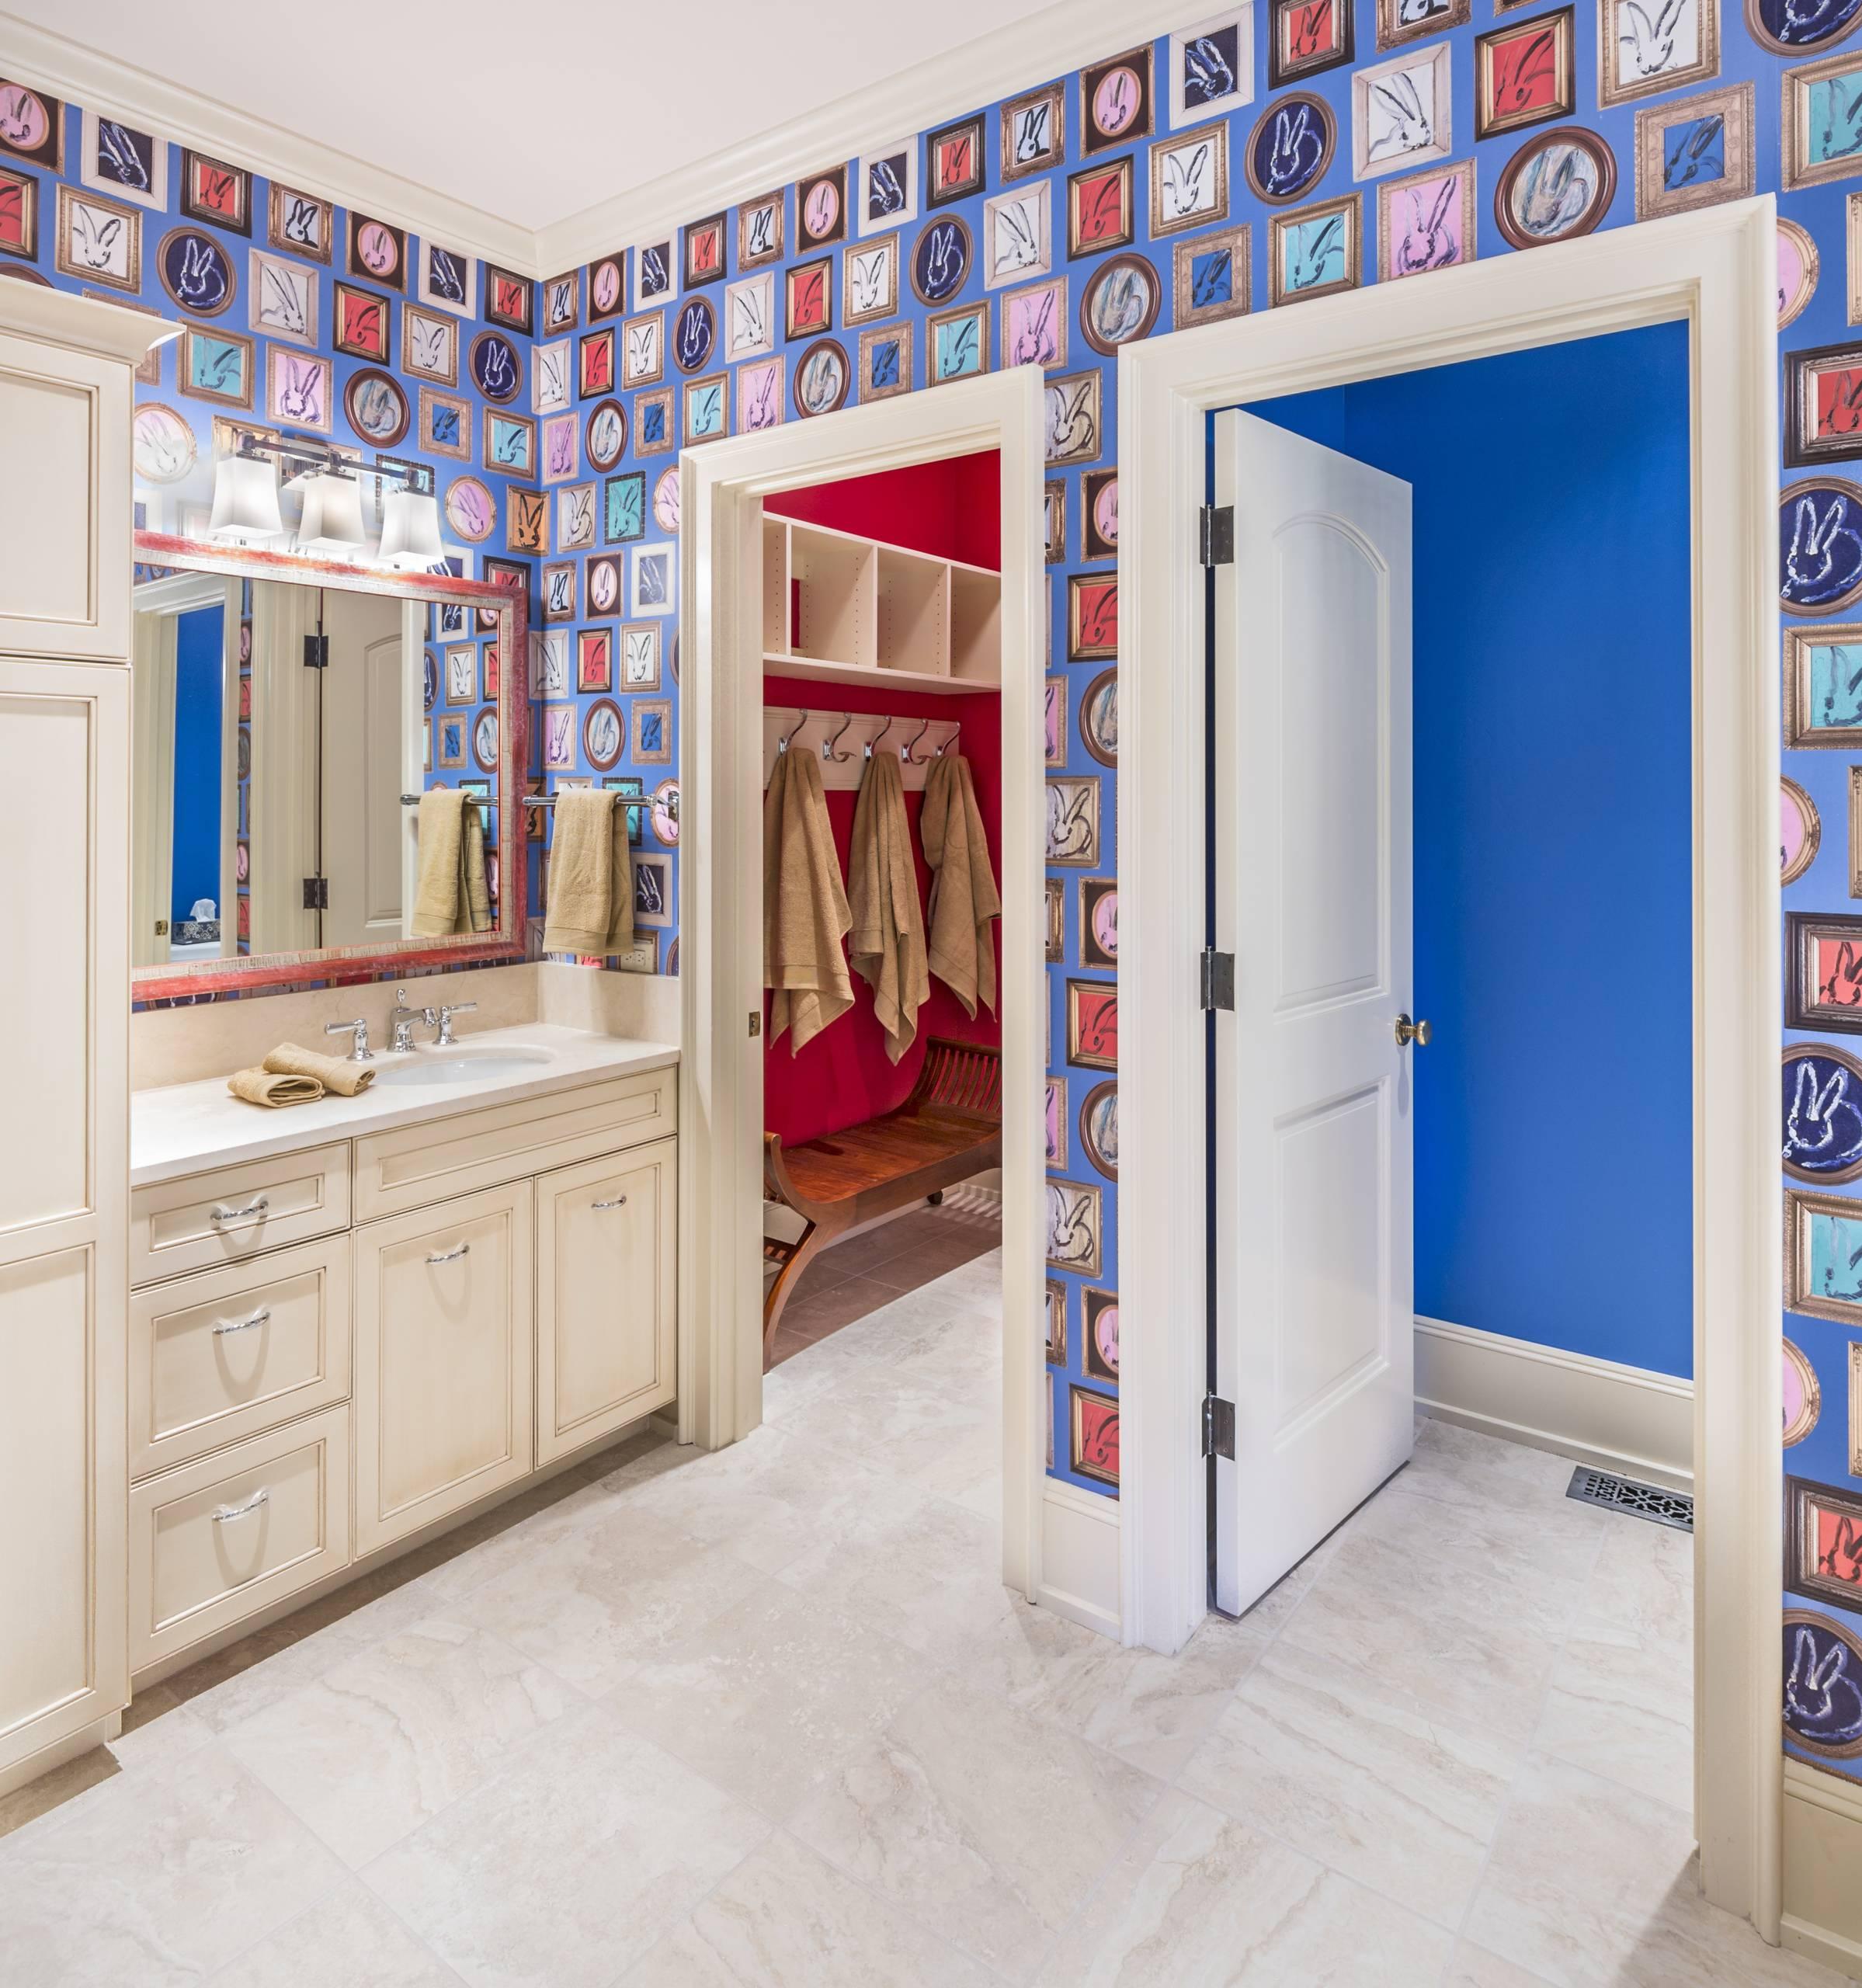 Certified Luxury Builders - Veritas Fine Homes Inc - Durango, CO - Weems Home